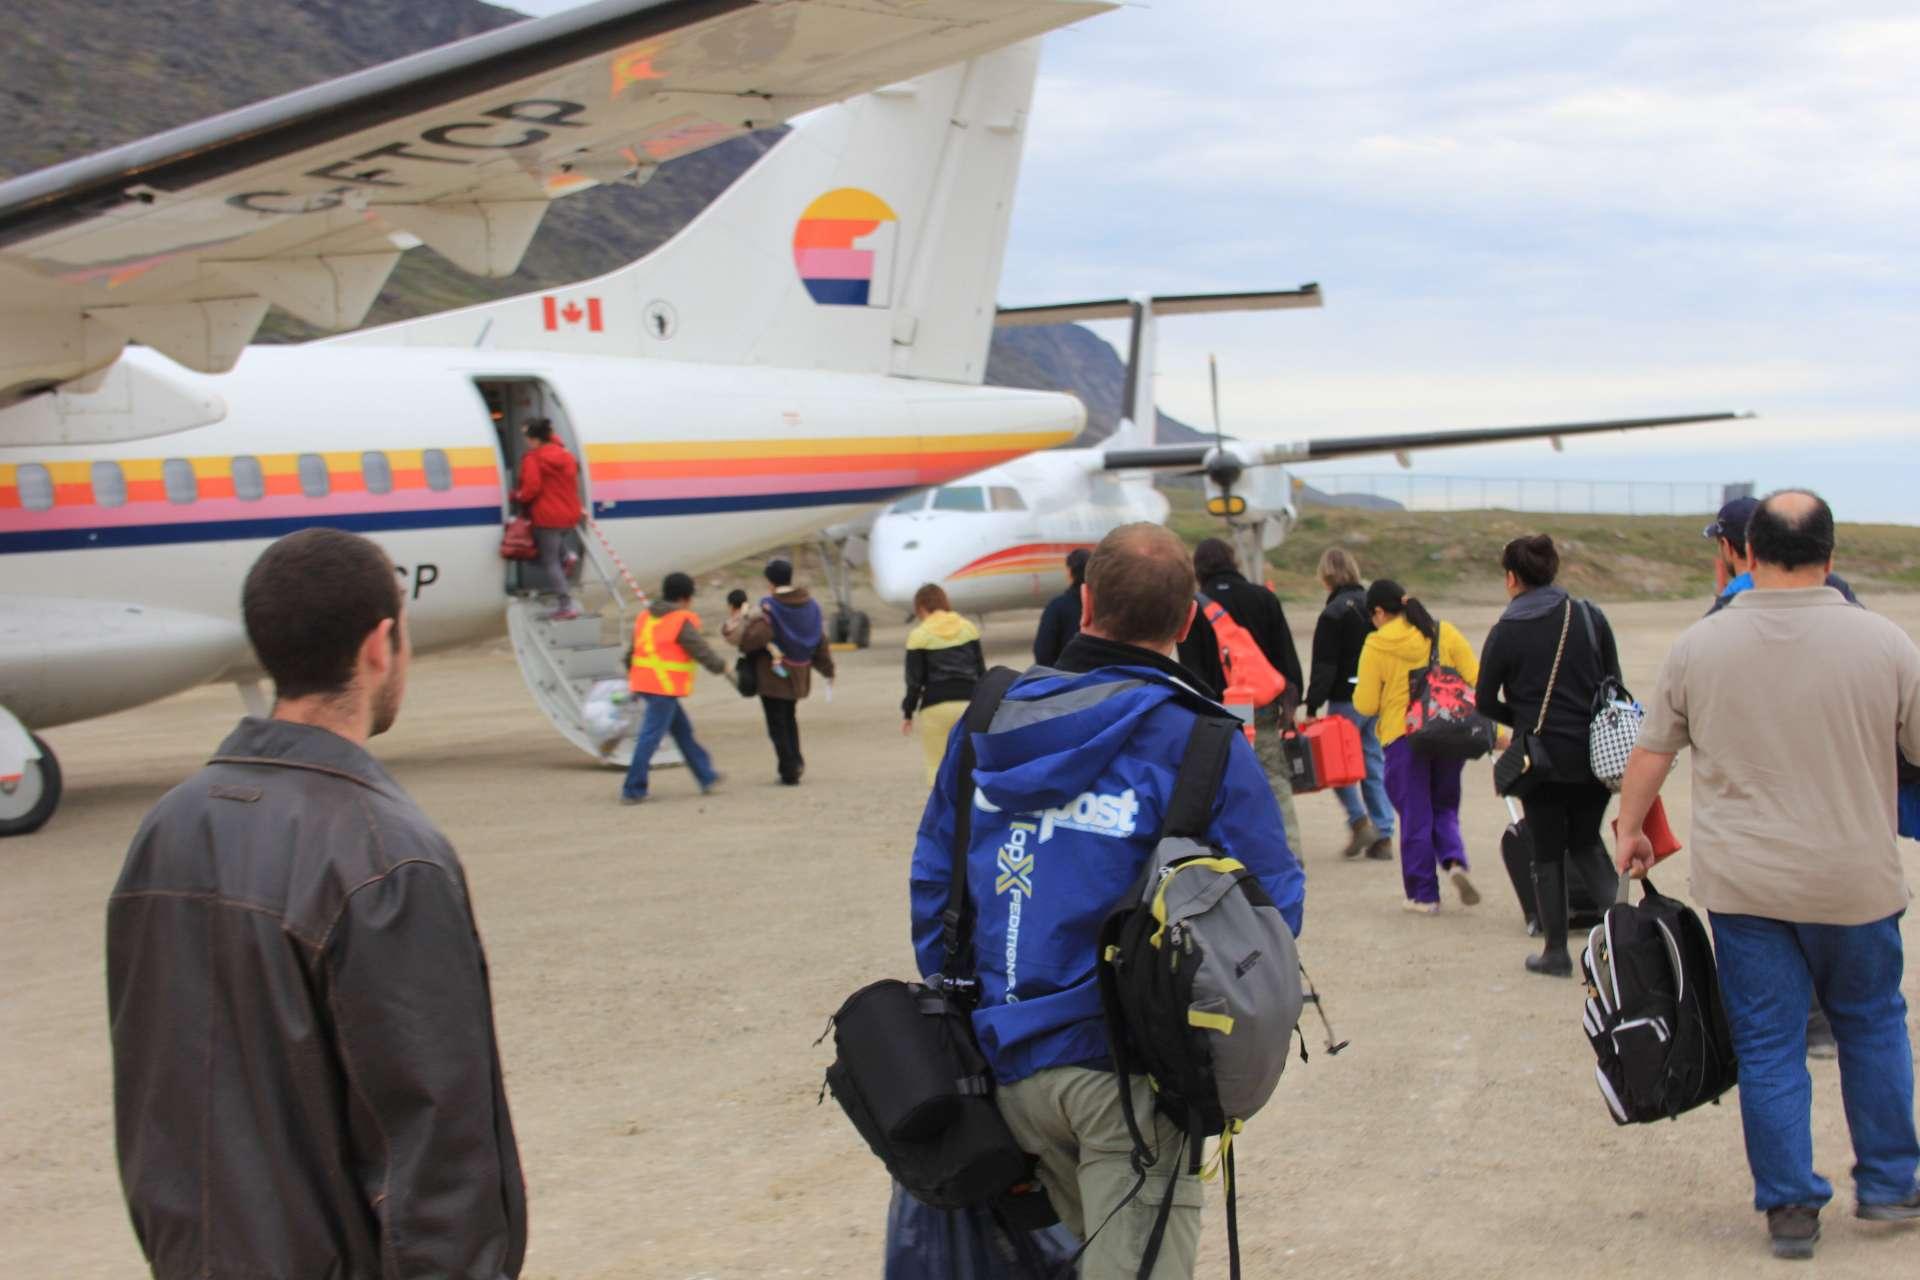 https://outpostmagazine.com Simon Vaughan opXpeditions Nunavut